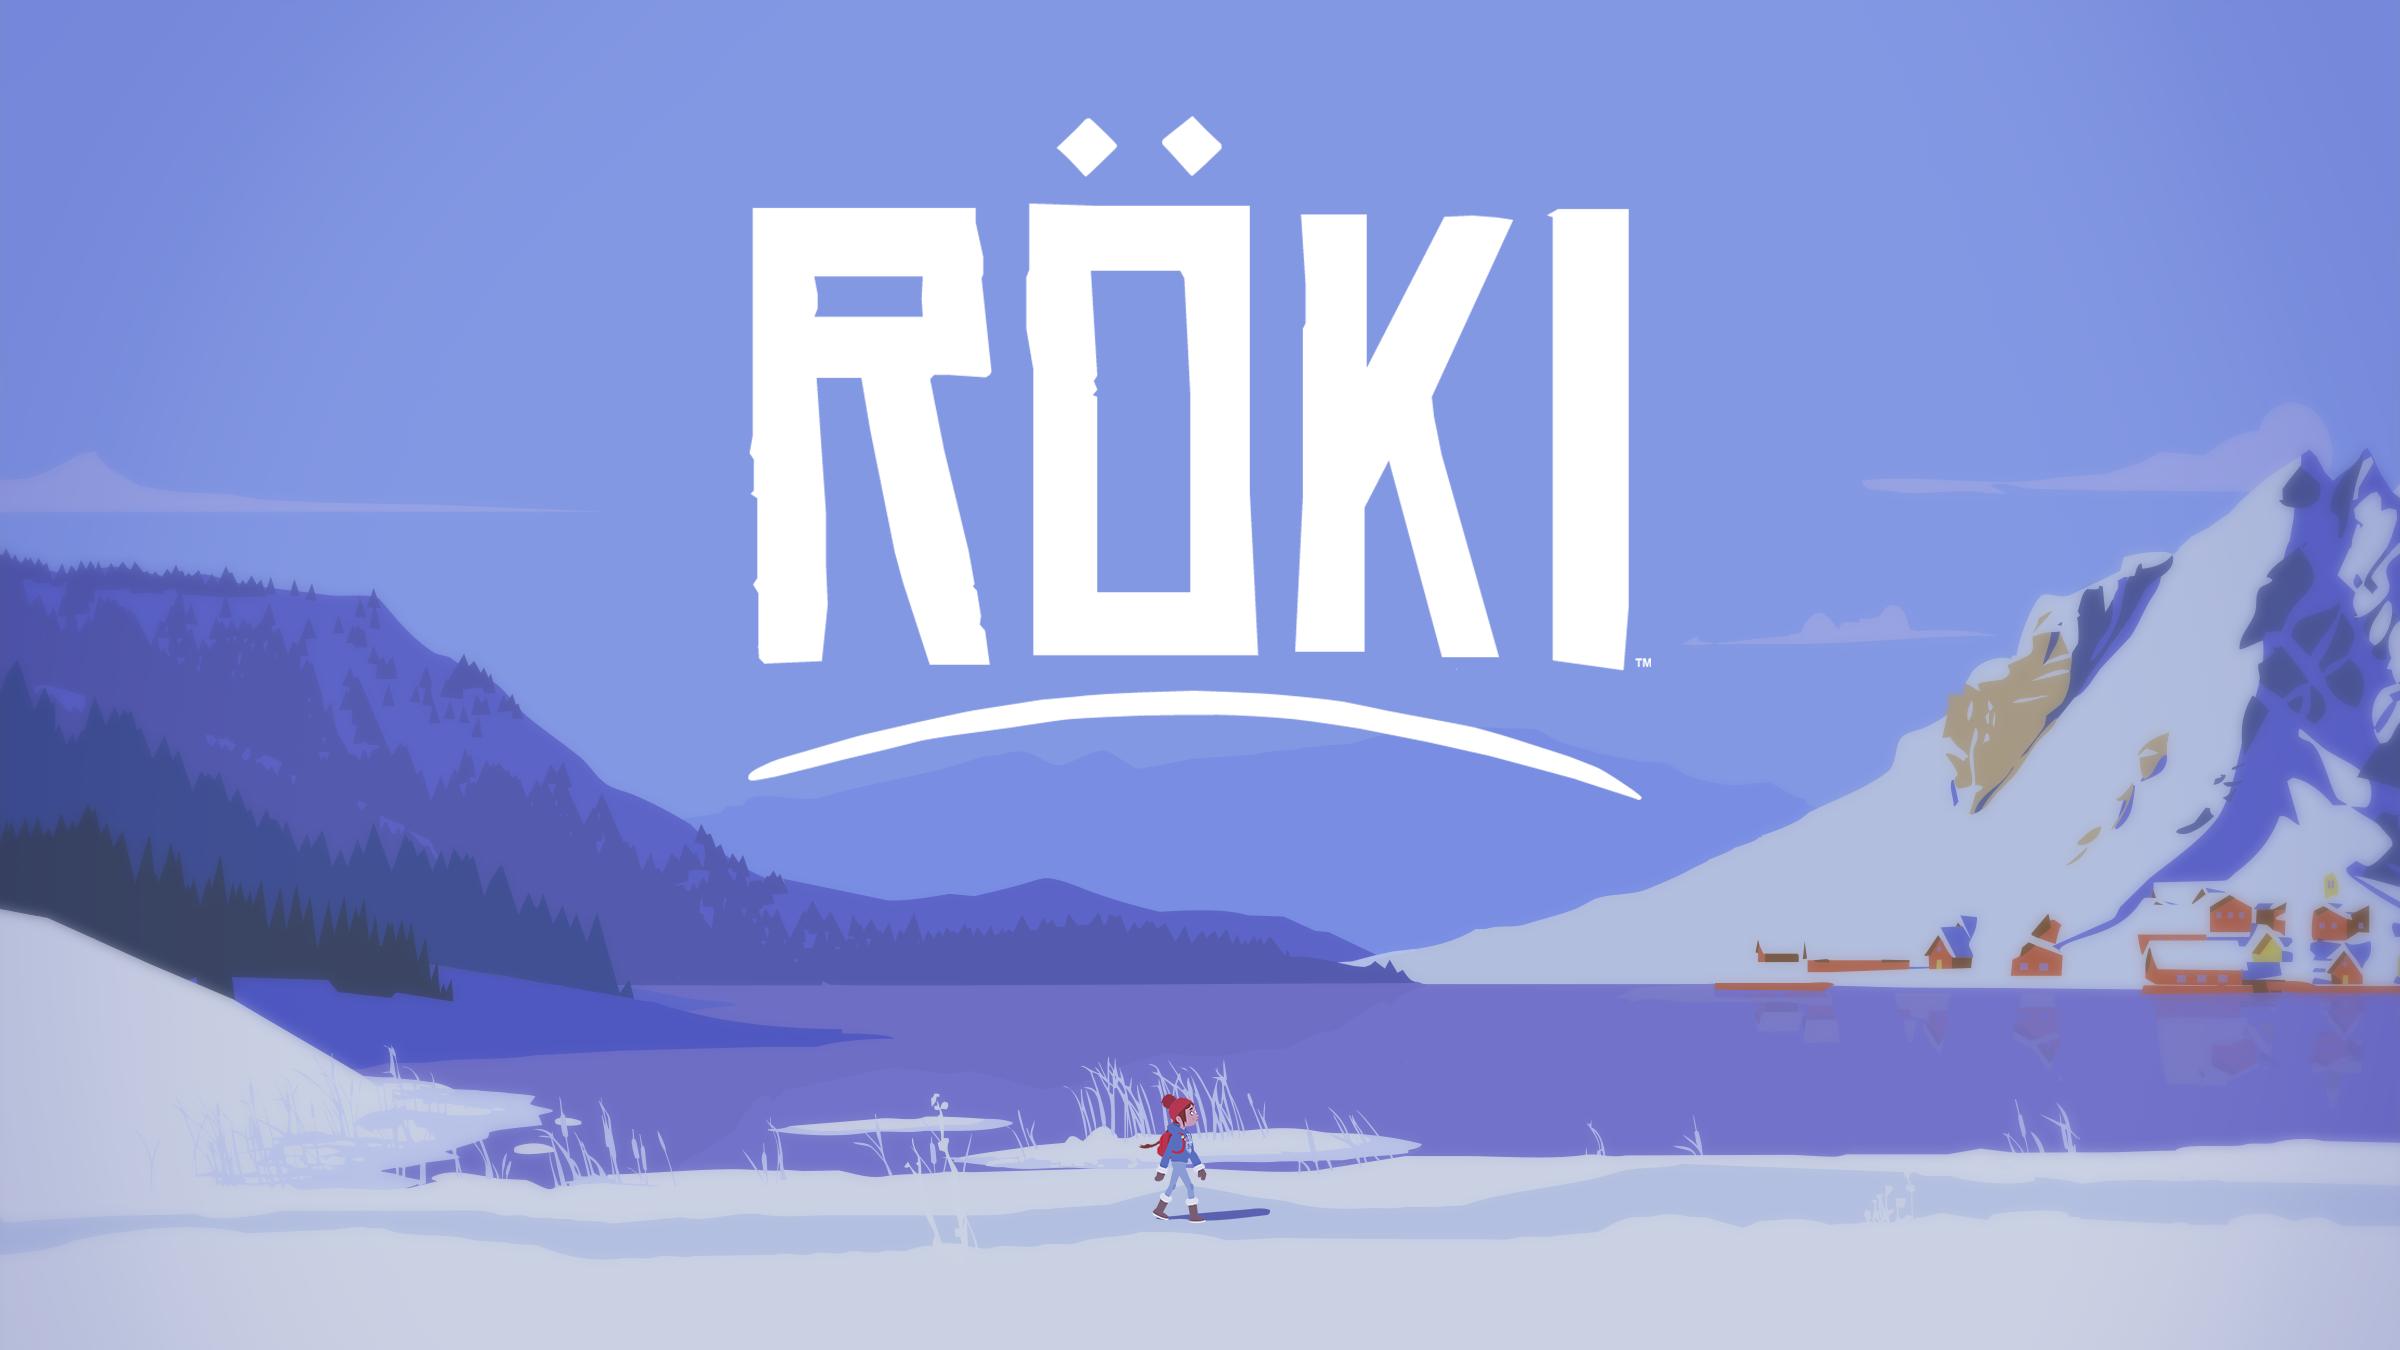 Röki_KeyArt_Landscape_Logo.png